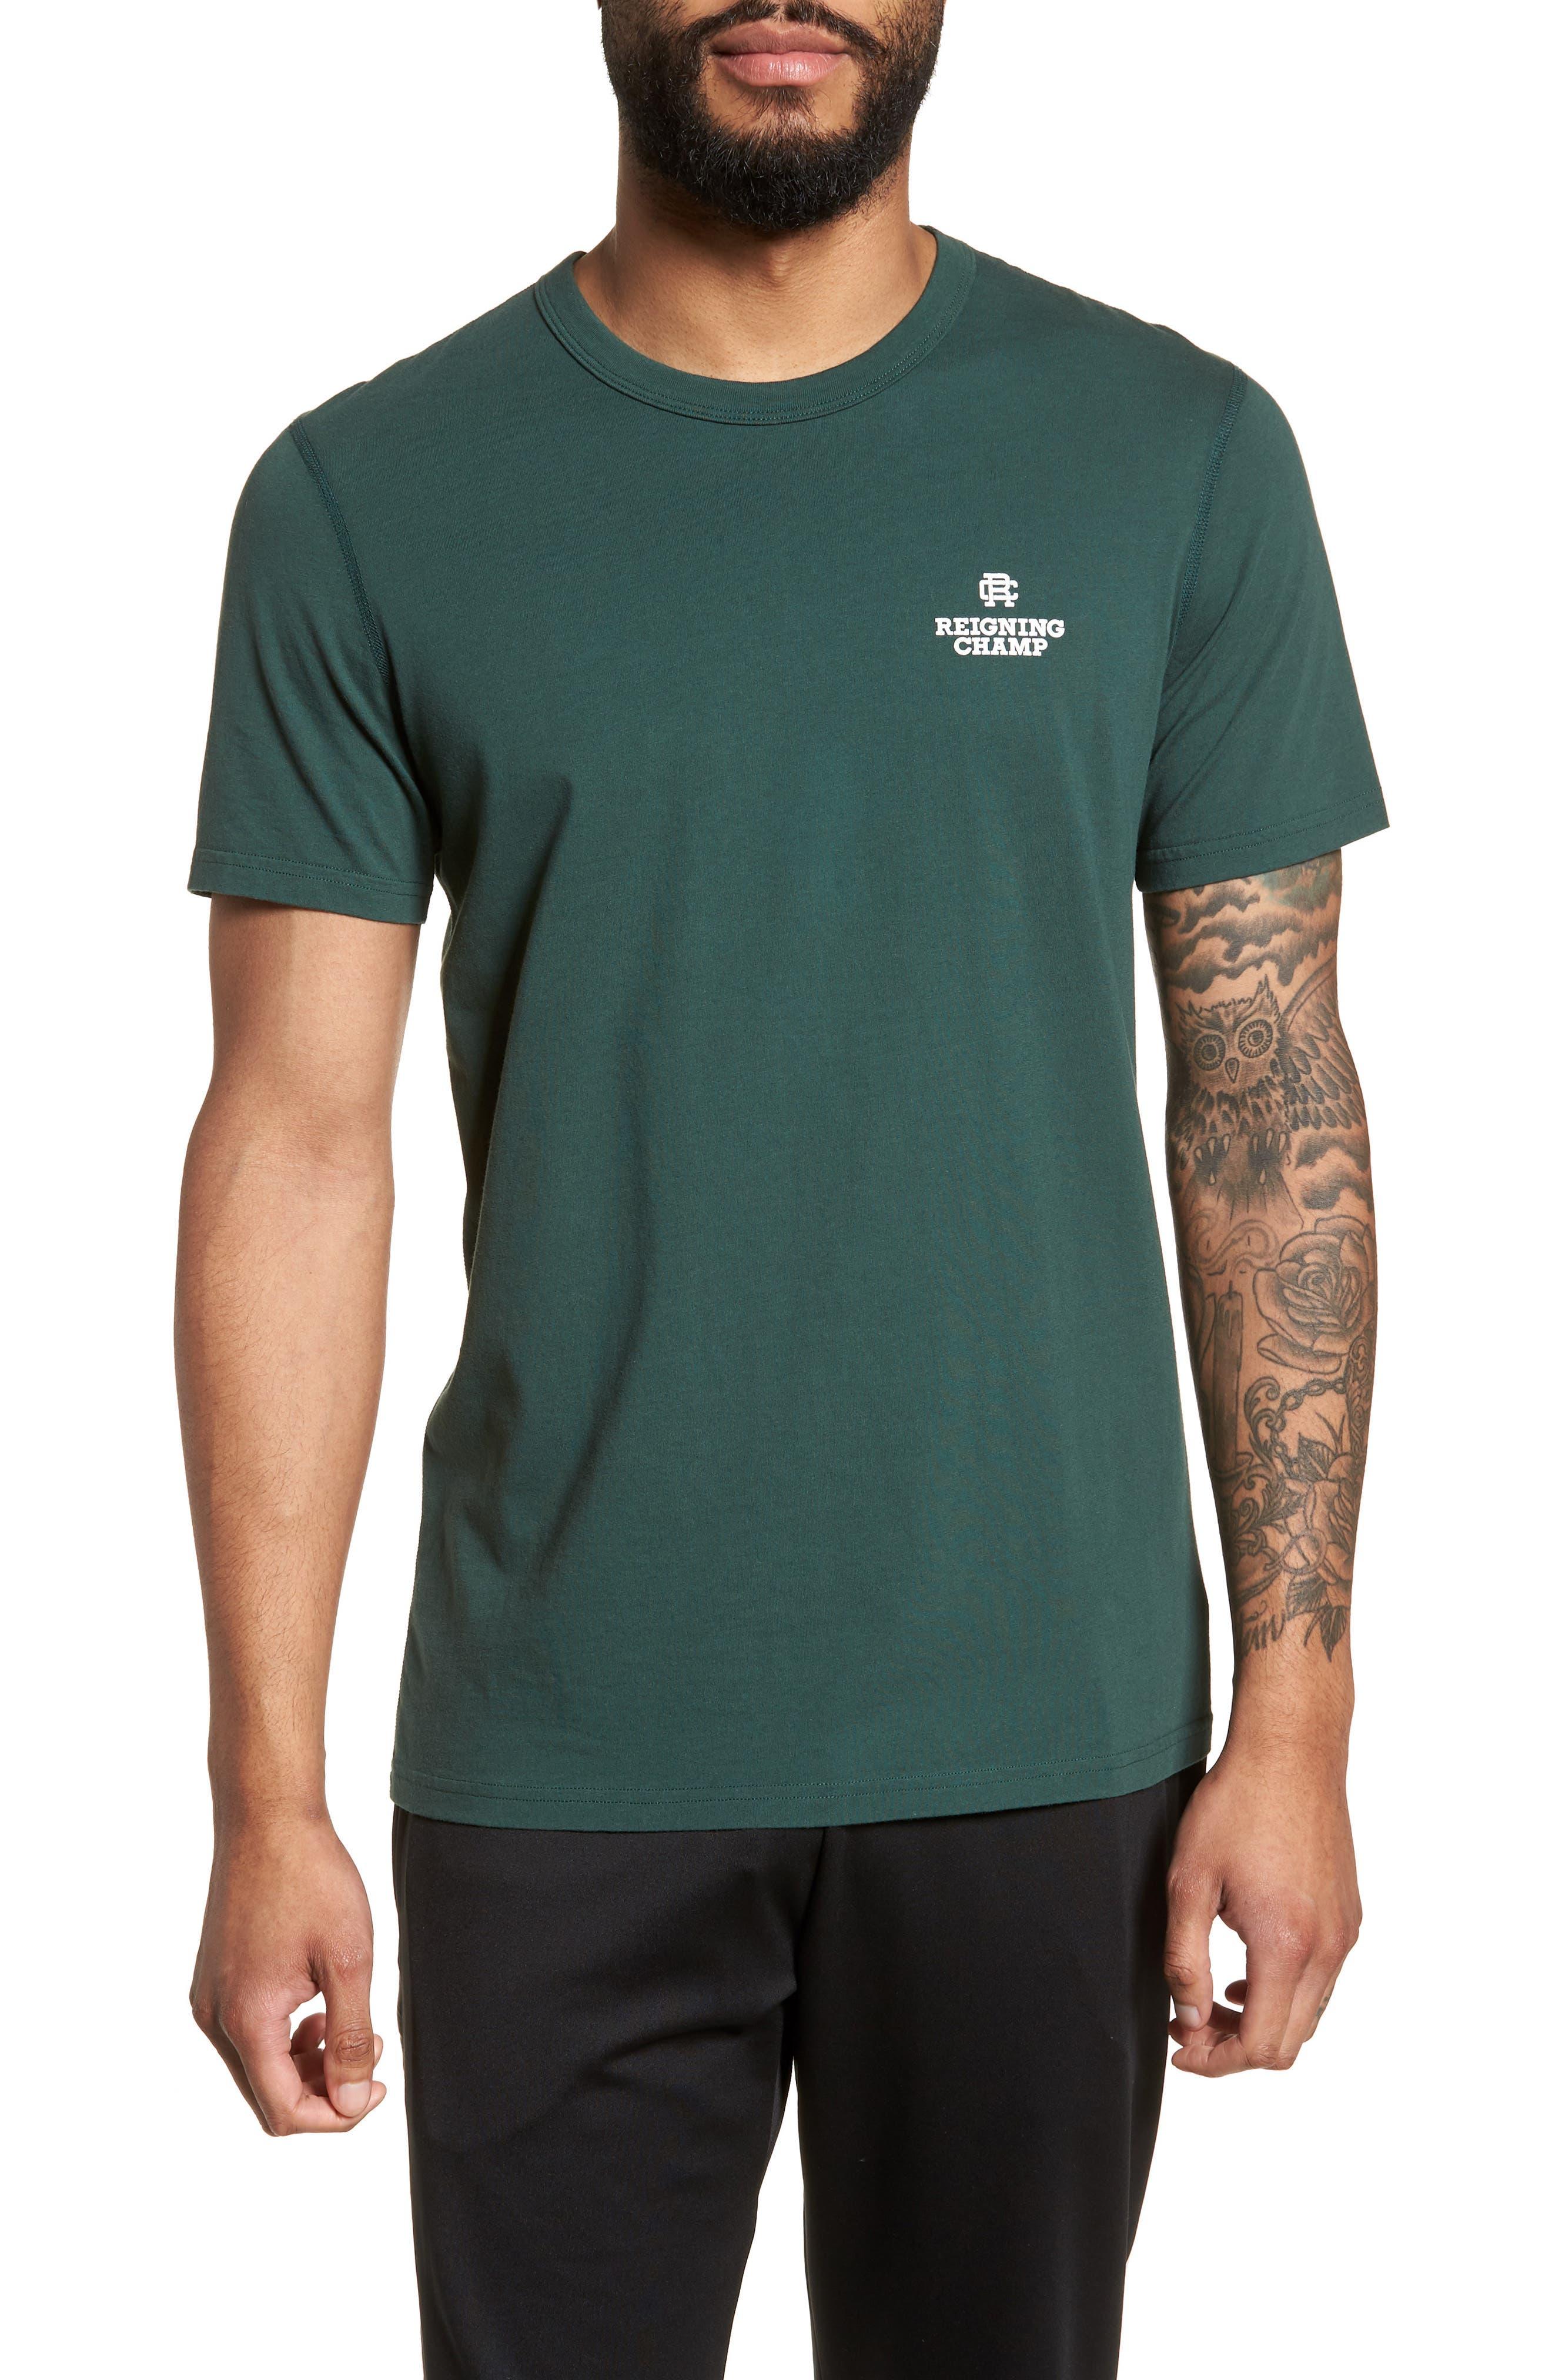 Reigning Champ Logo T Shirt Nordstrom Rack